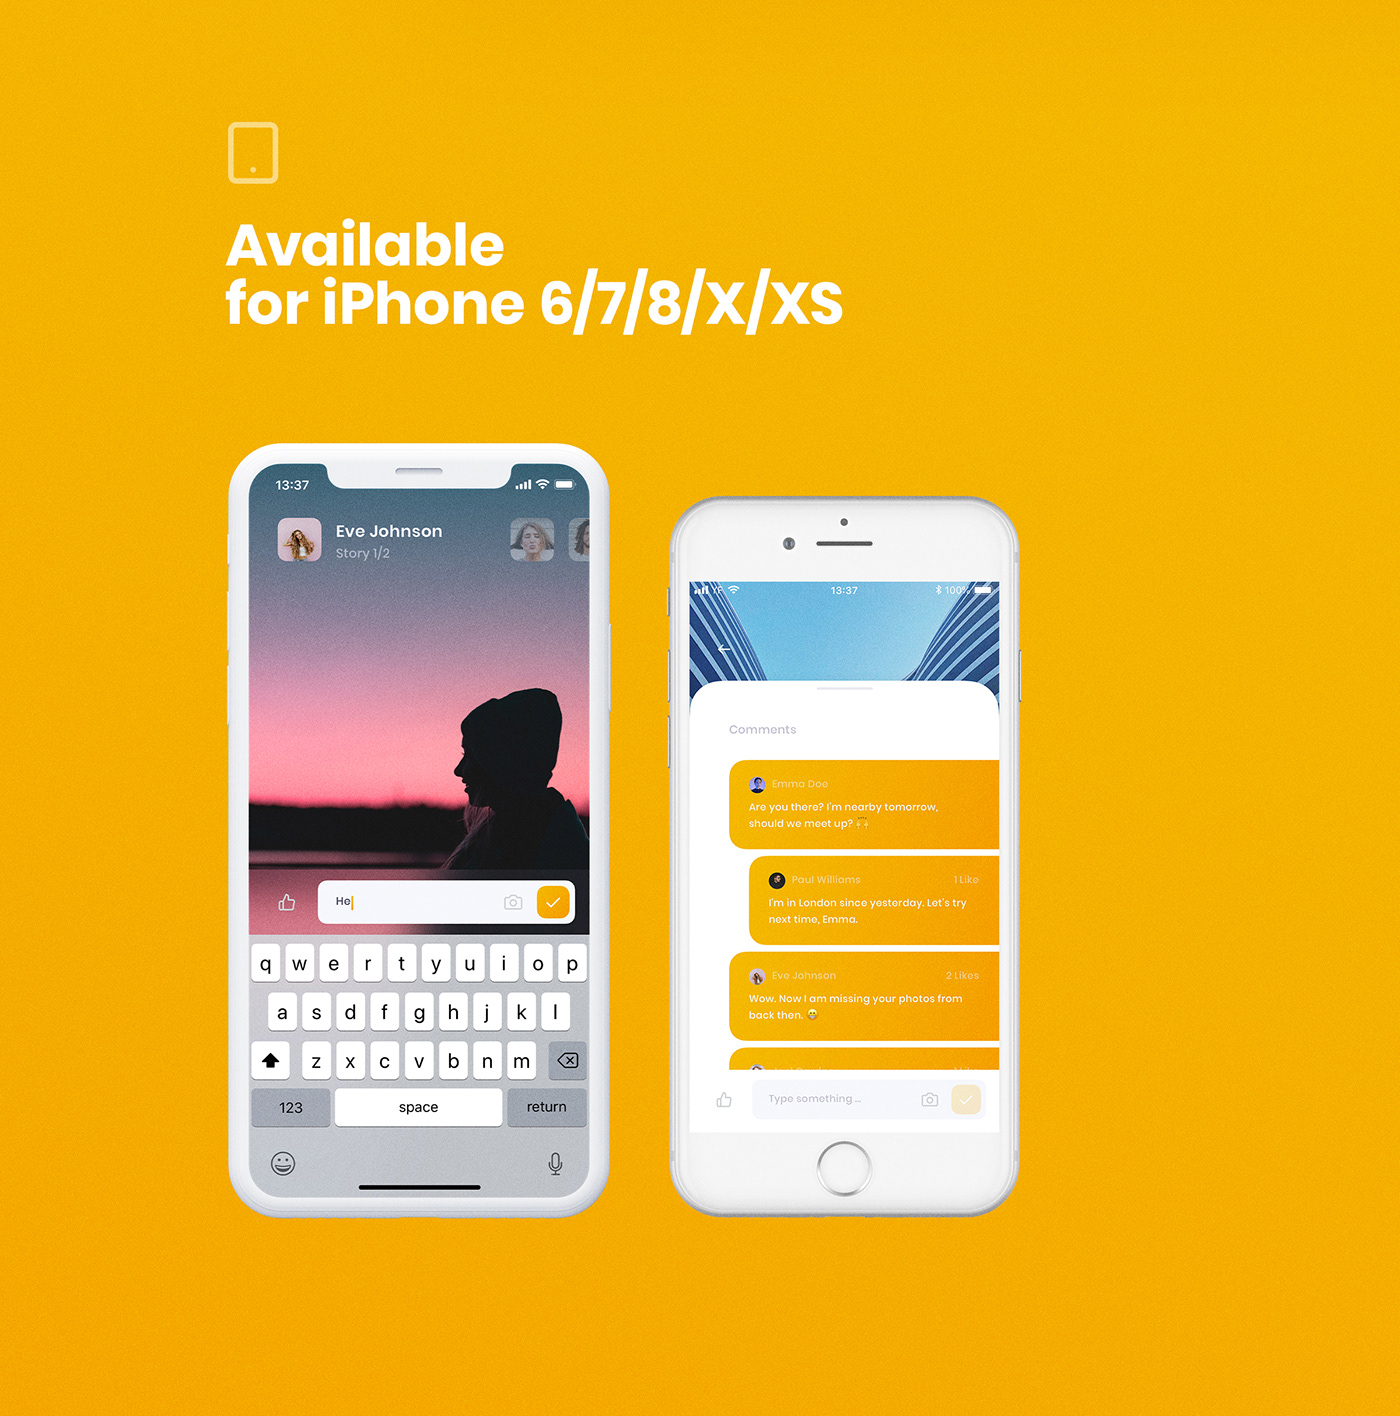 user experience user INTERFACE UI KIT mobile design UI UX UI8 TEMPLATE IOS STYLEKIT